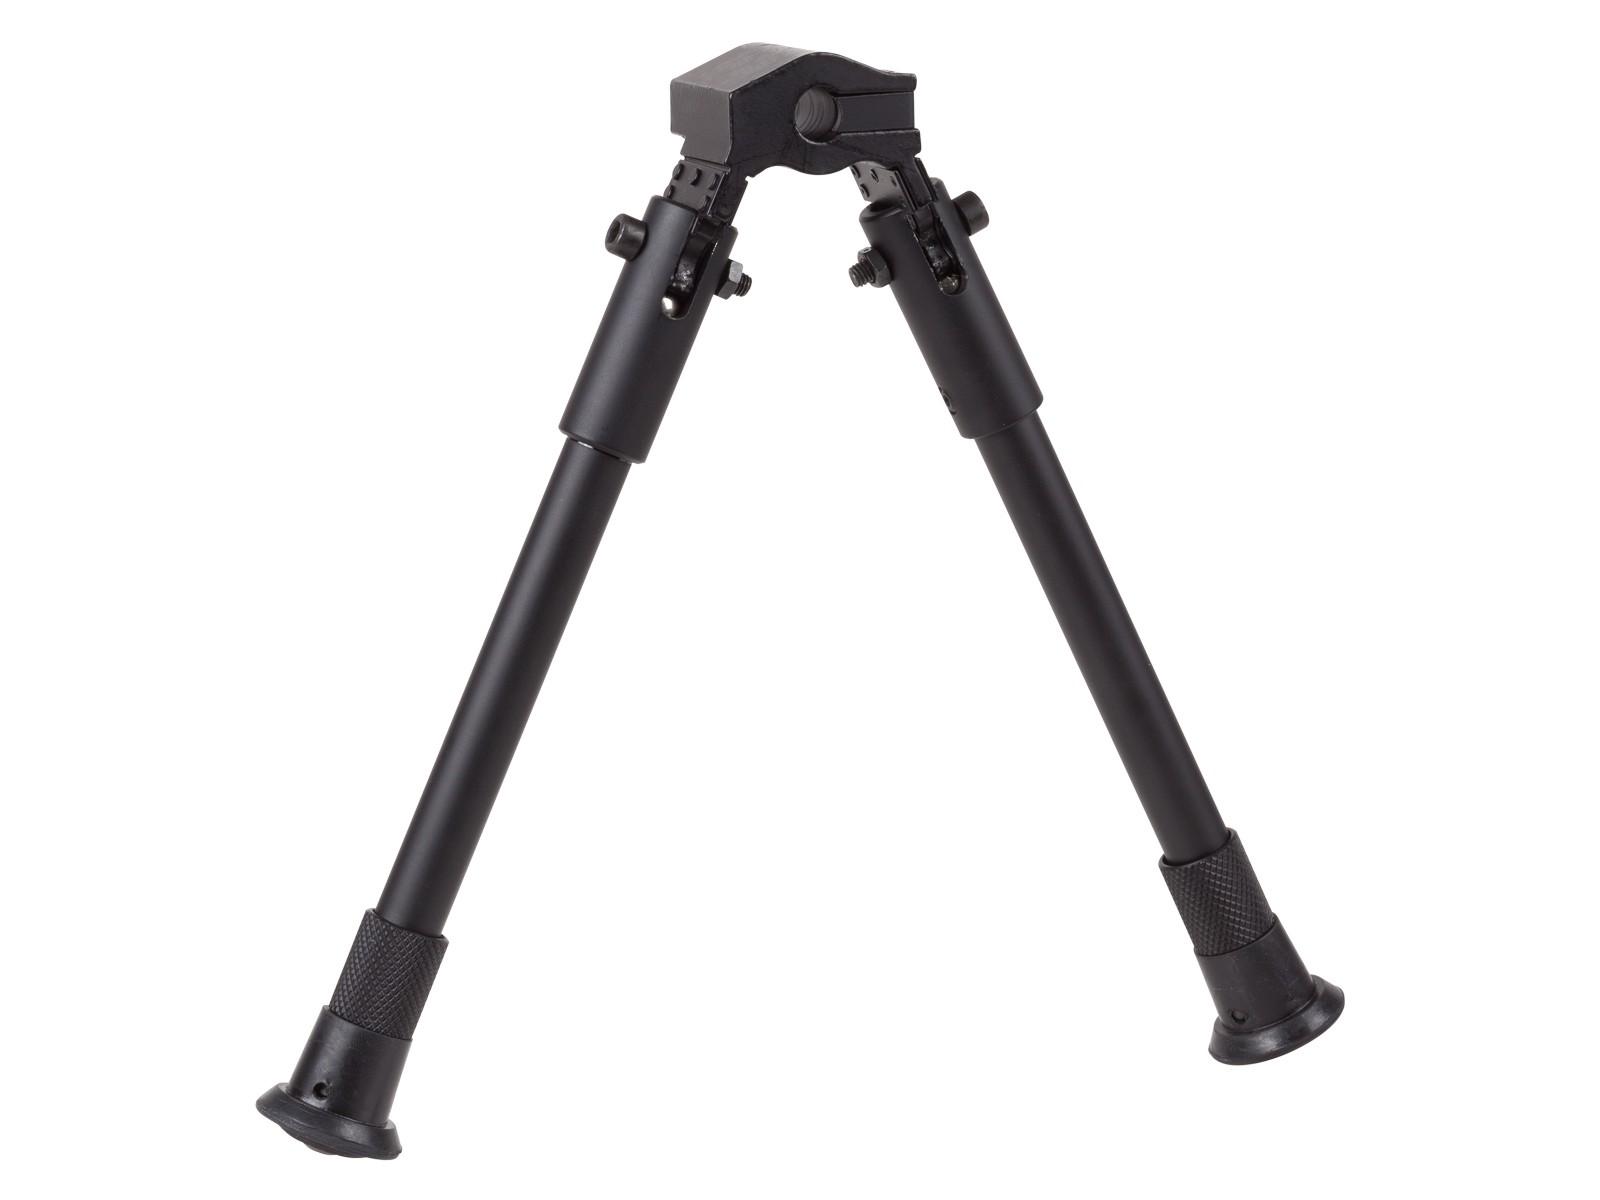 TSD Metal Bi-pod, Fits SD98 & Echo 1 A.S.R. Airsoft Sniper Rifles